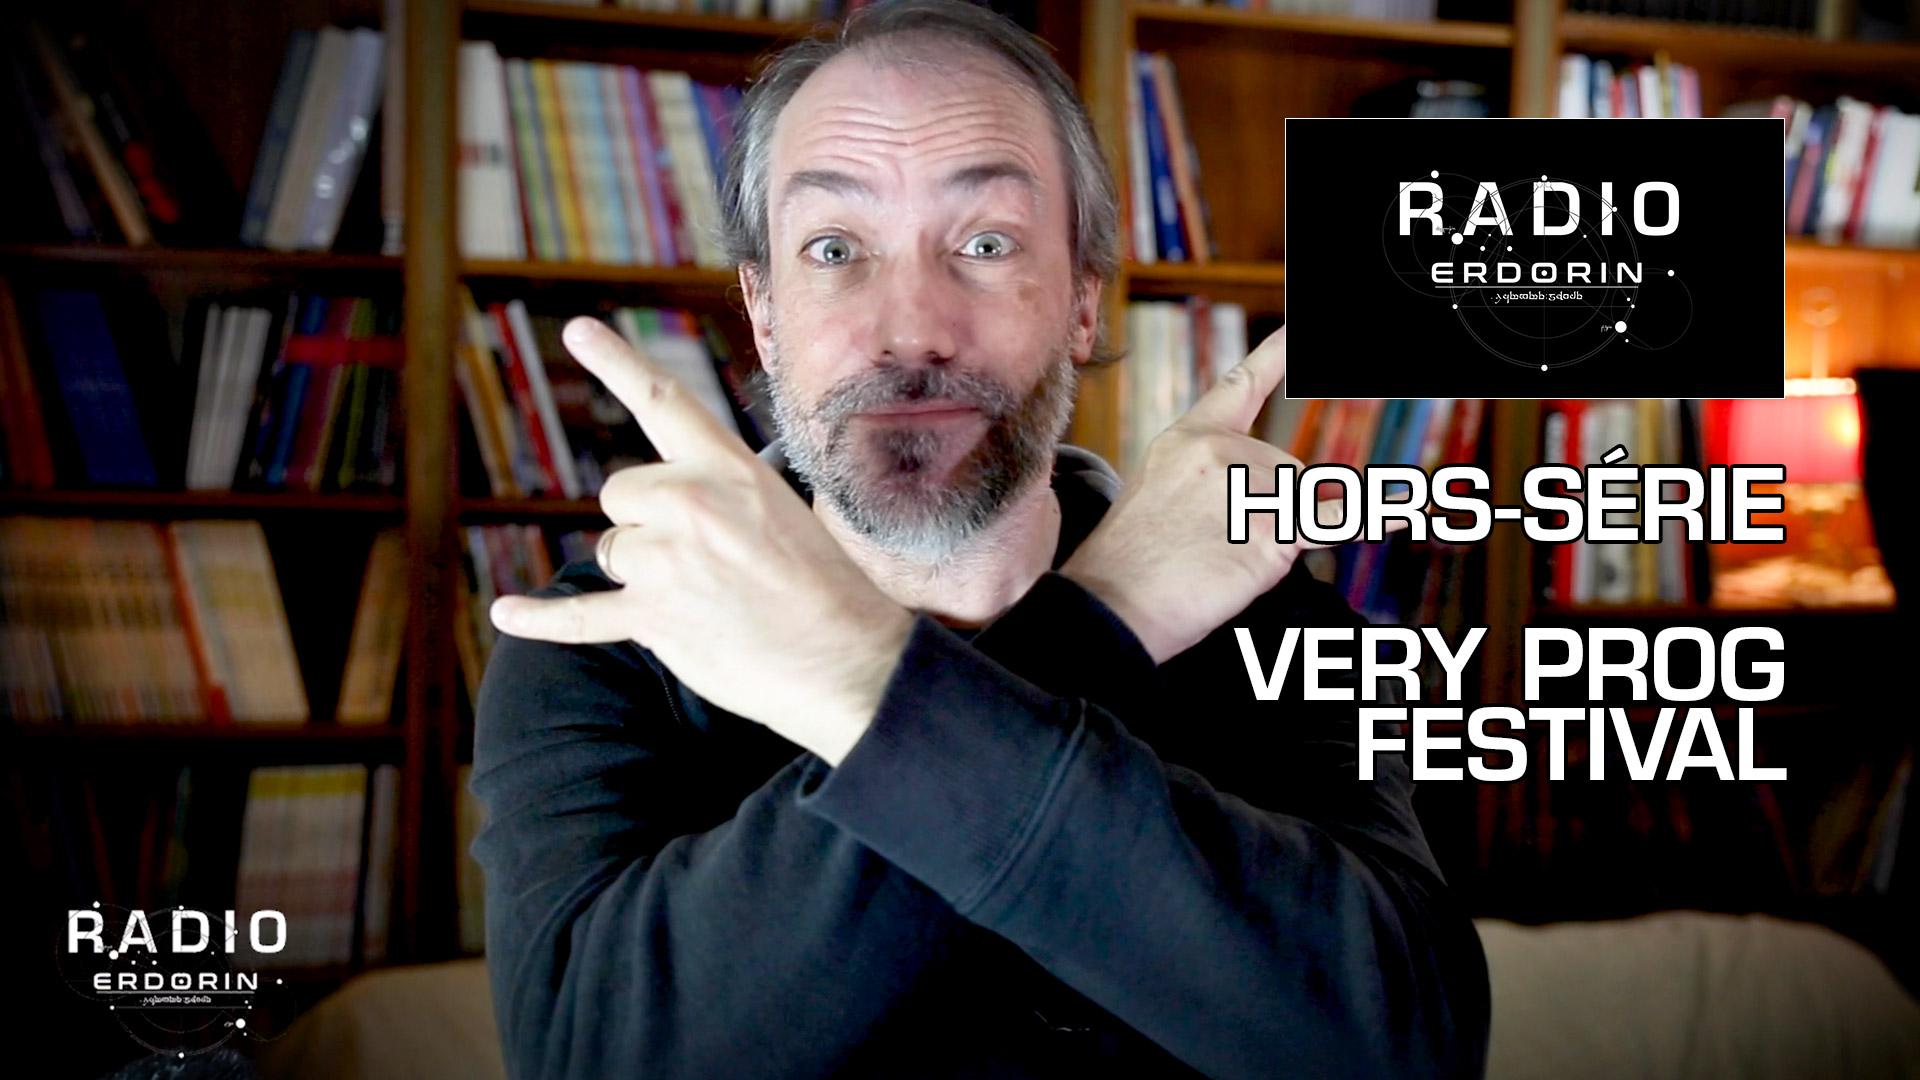 Radio-Erdorin HS1 – Very Prog Festival